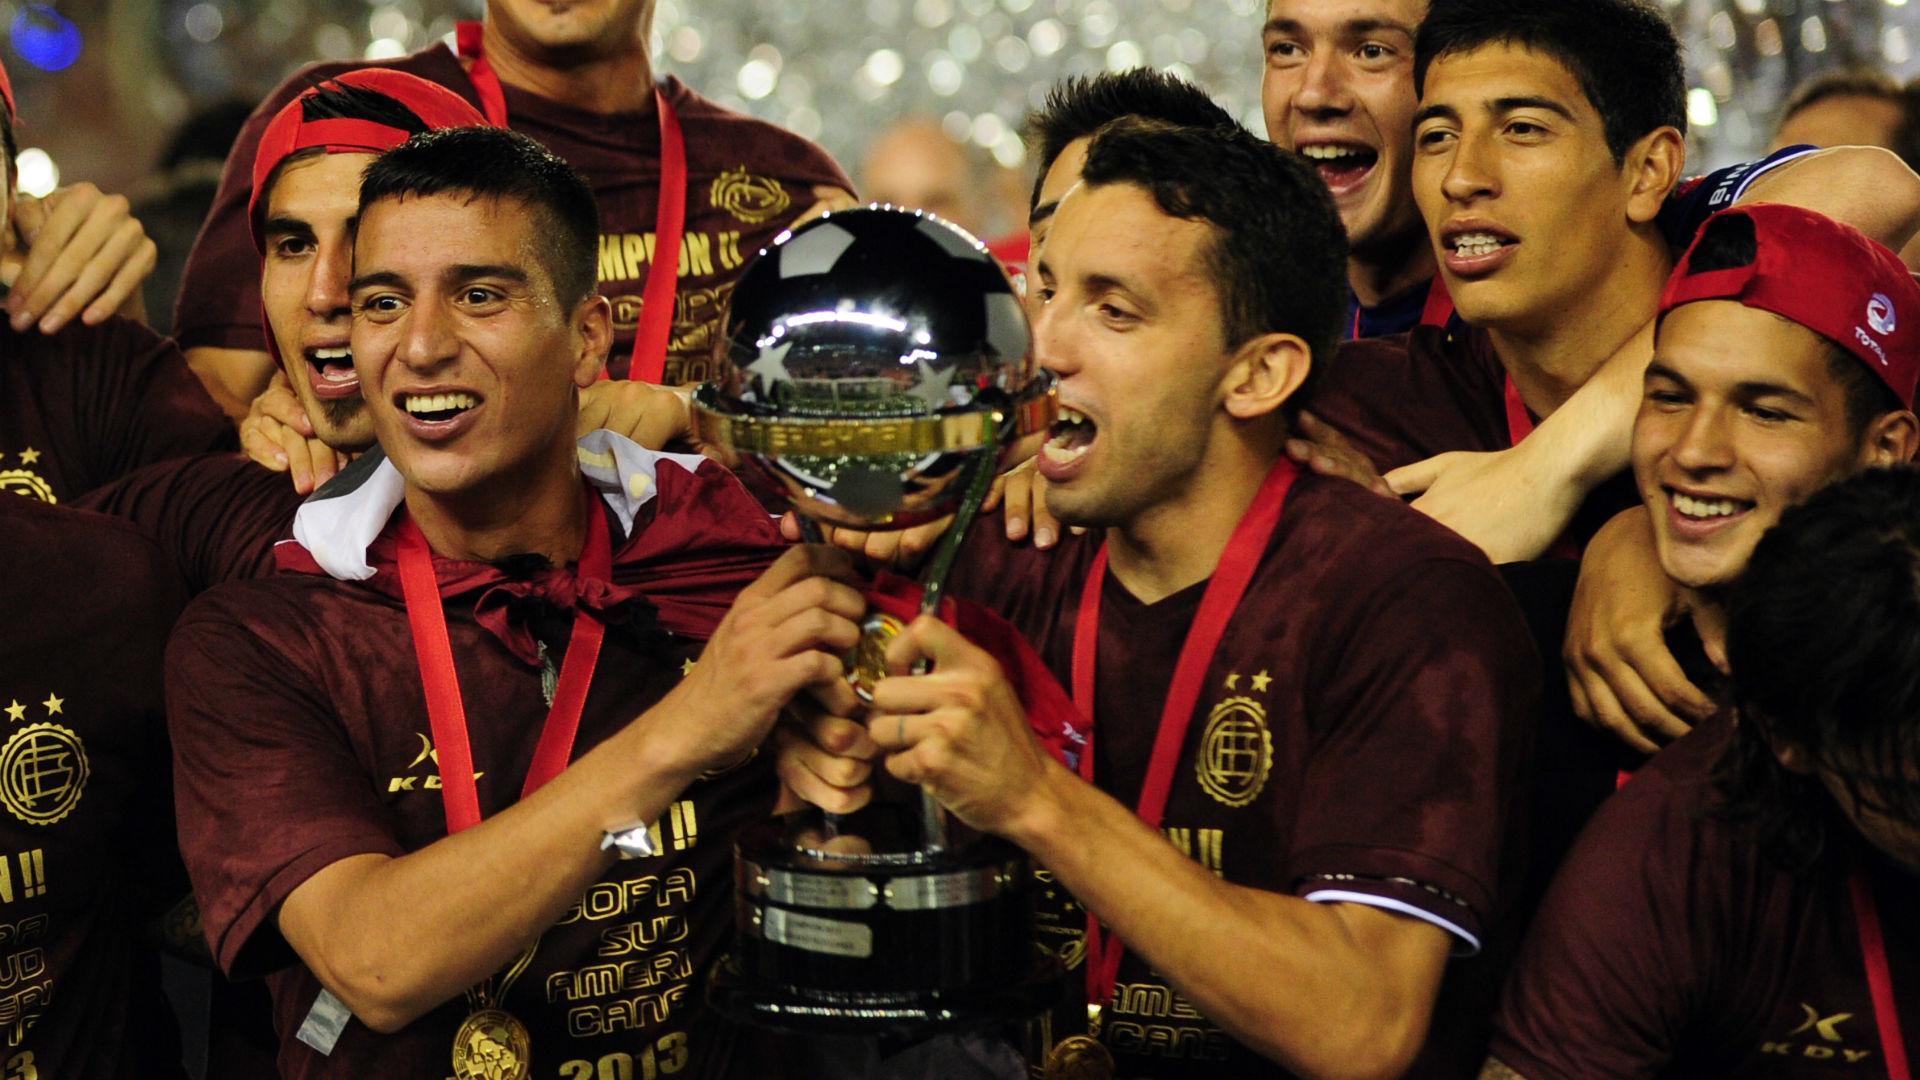 Jorge Marciano Ortiz Diego Pulpo Gonzalez Copa Sudamericana 2013 Lanus